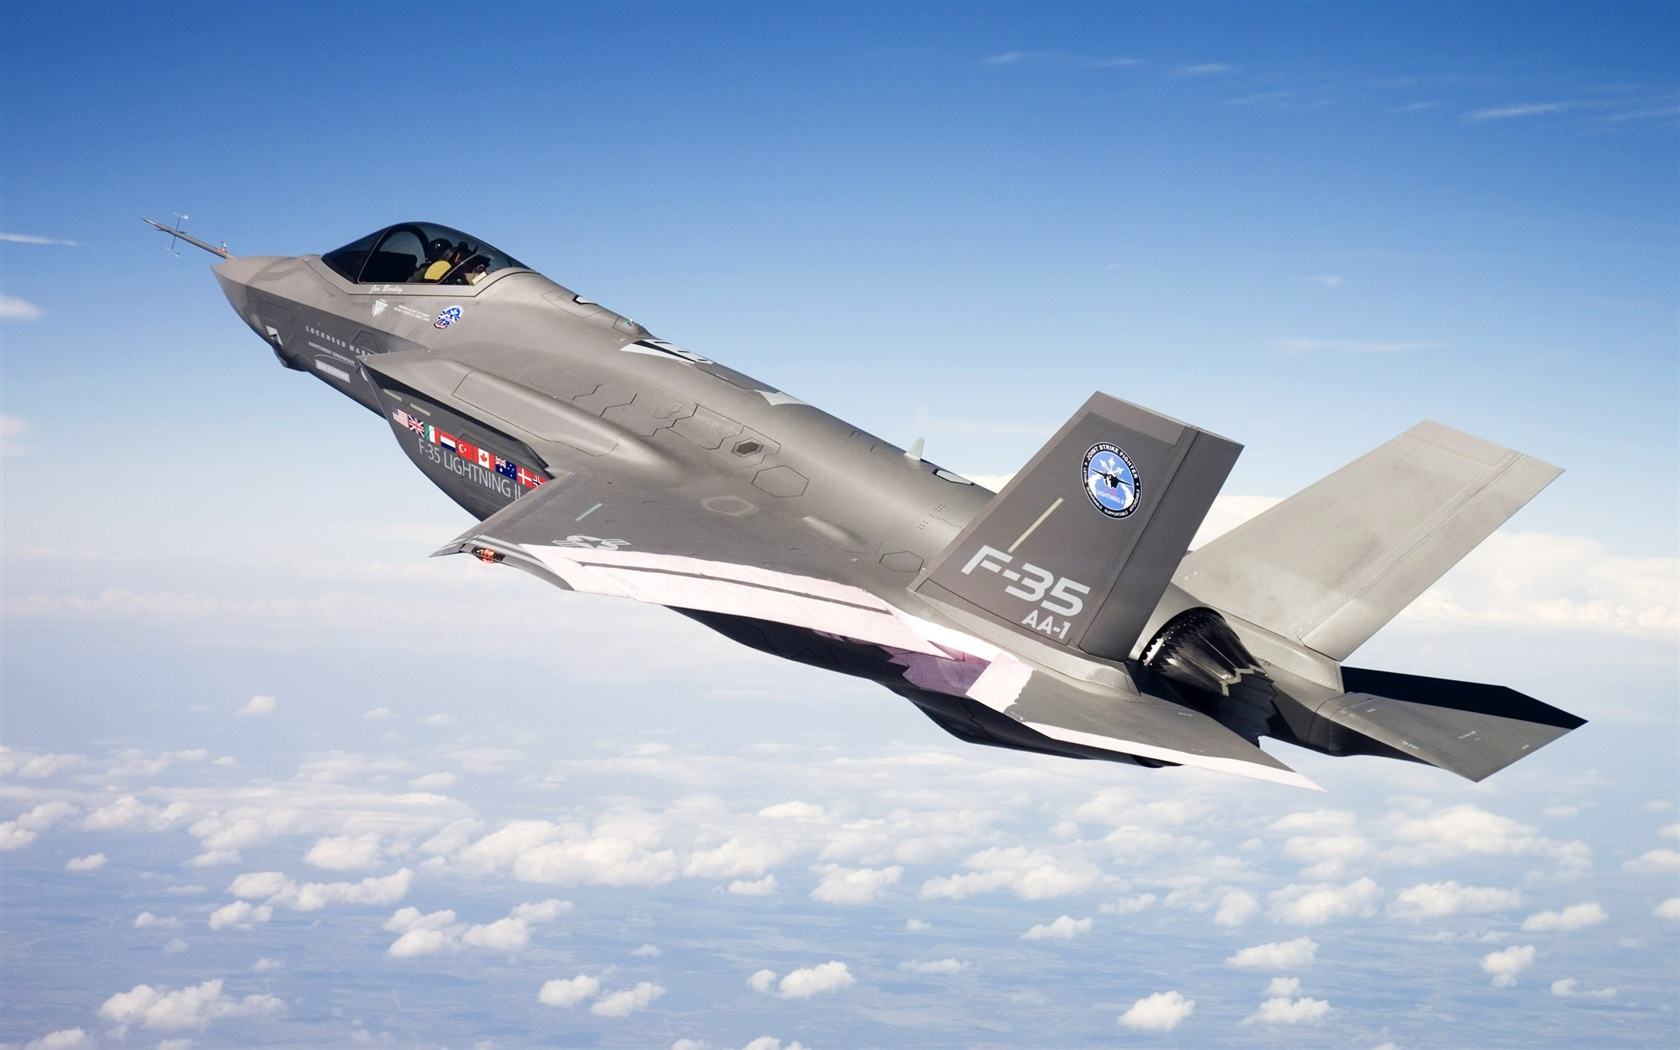 F 35 (戦闘機)の画像 p1_36